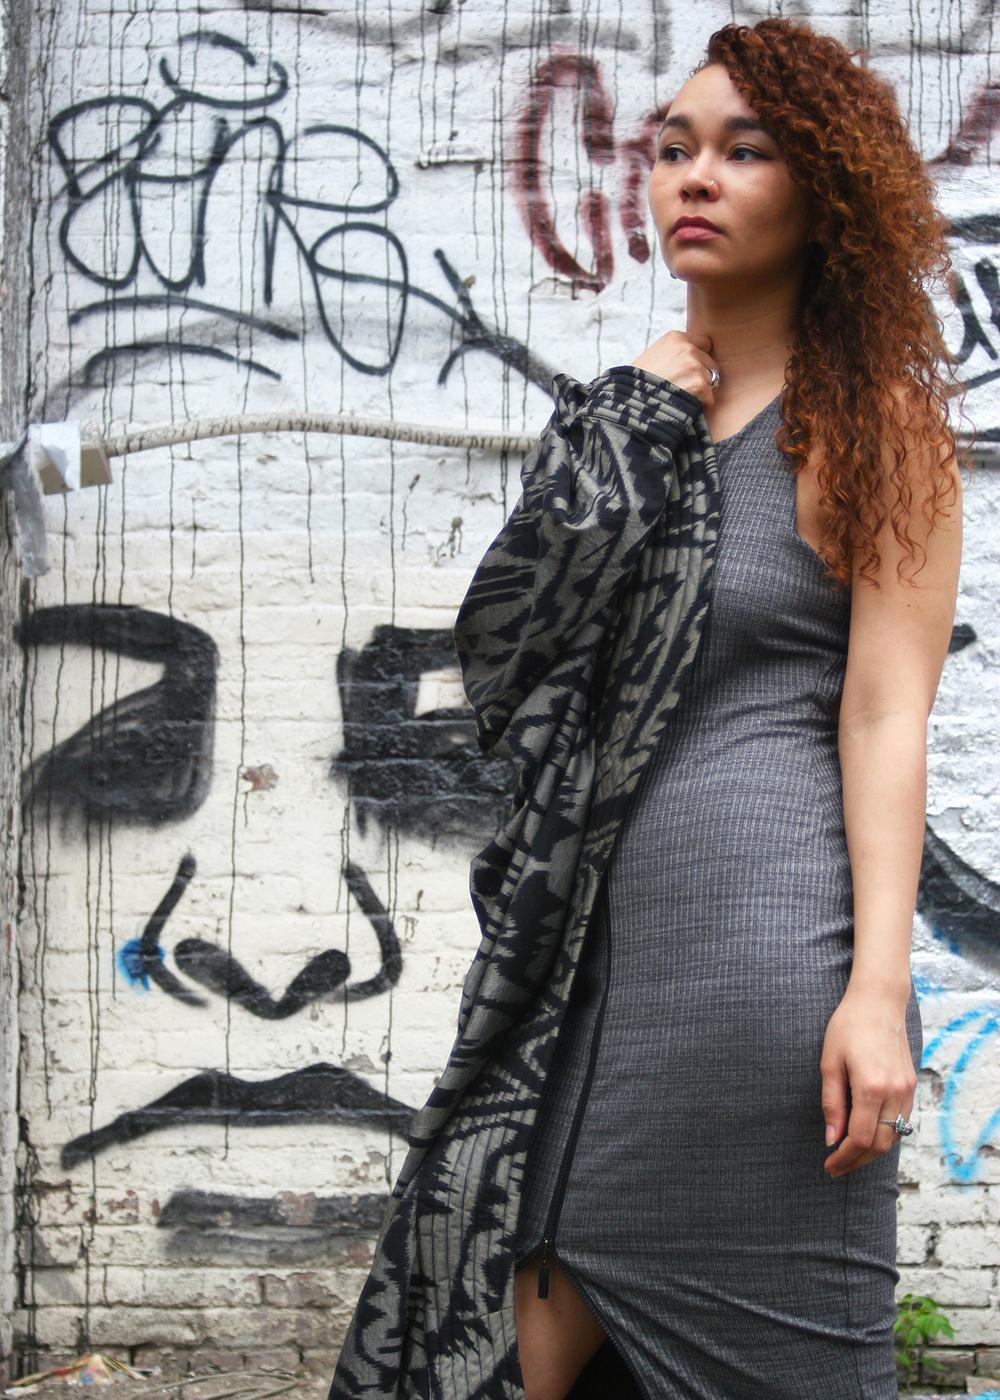 Kimono Backstreets - Athletic Clothes mixed with Graphic Kimonos Image 15